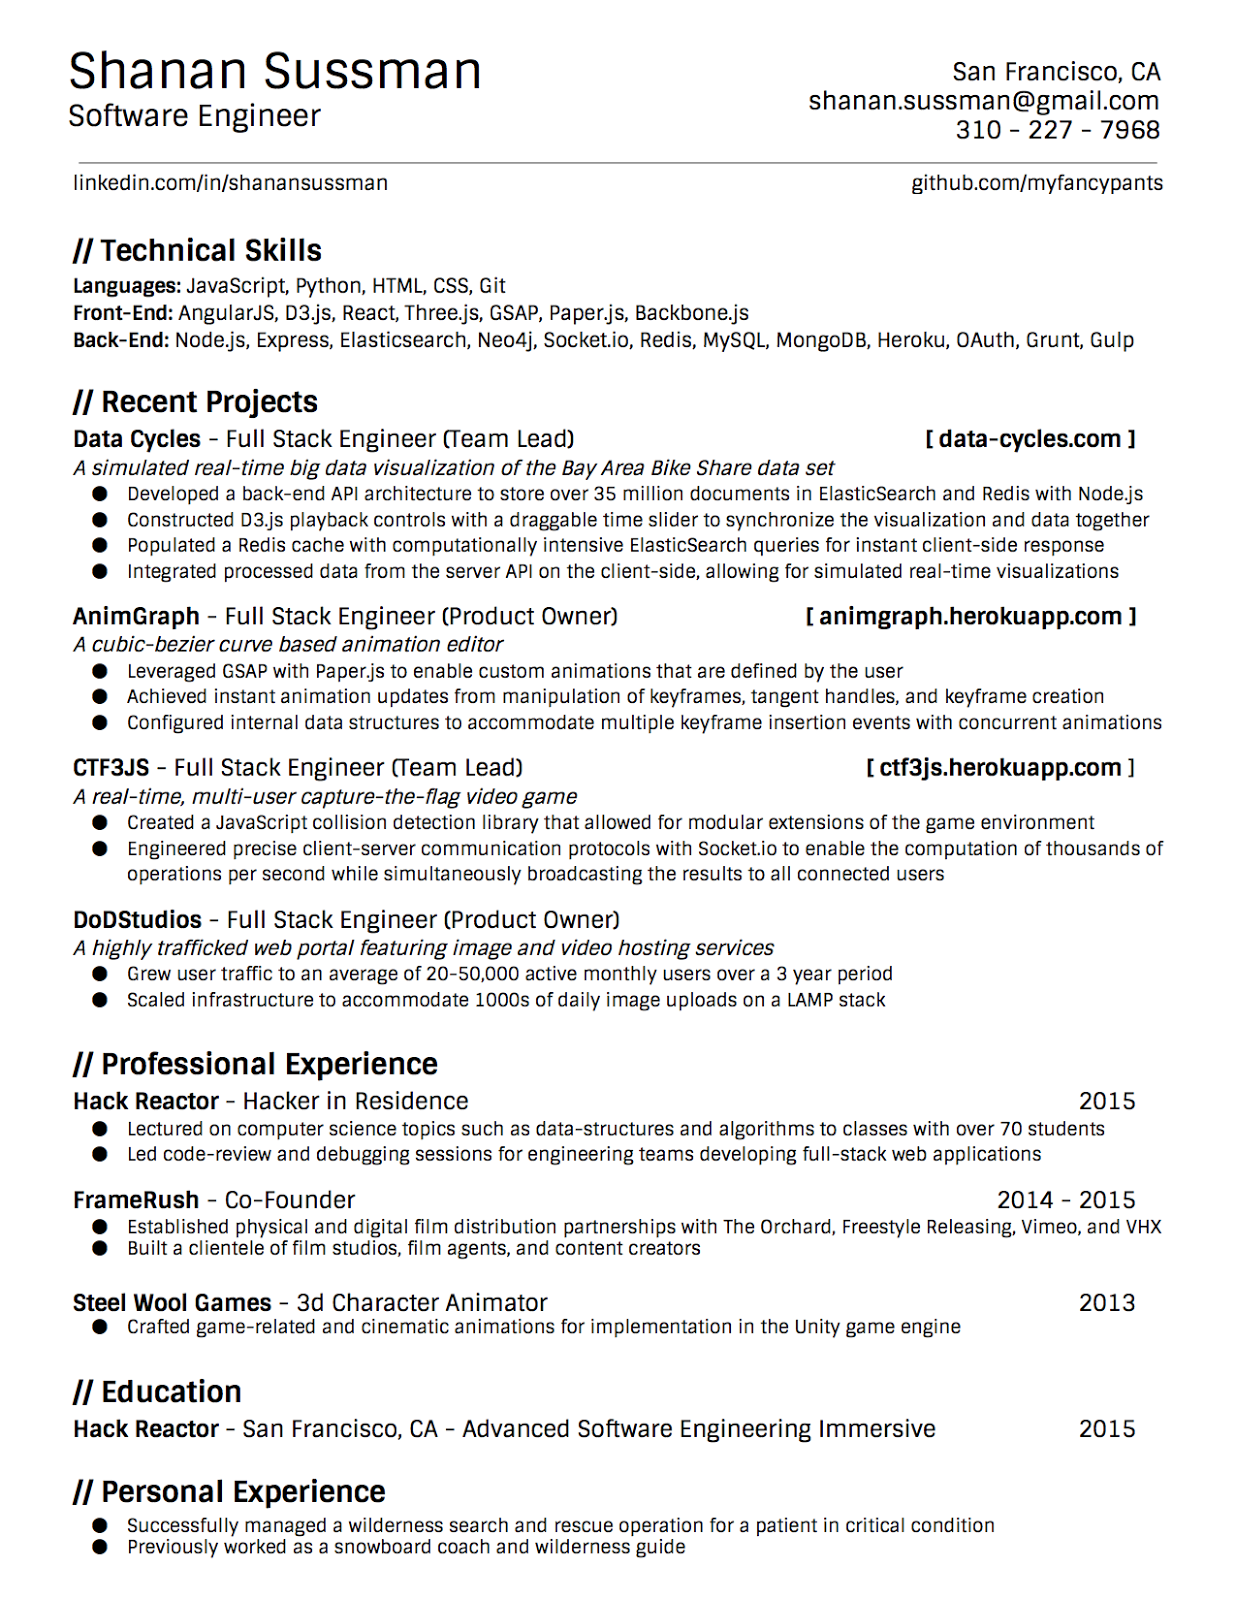 Shanan Sussman: Resume